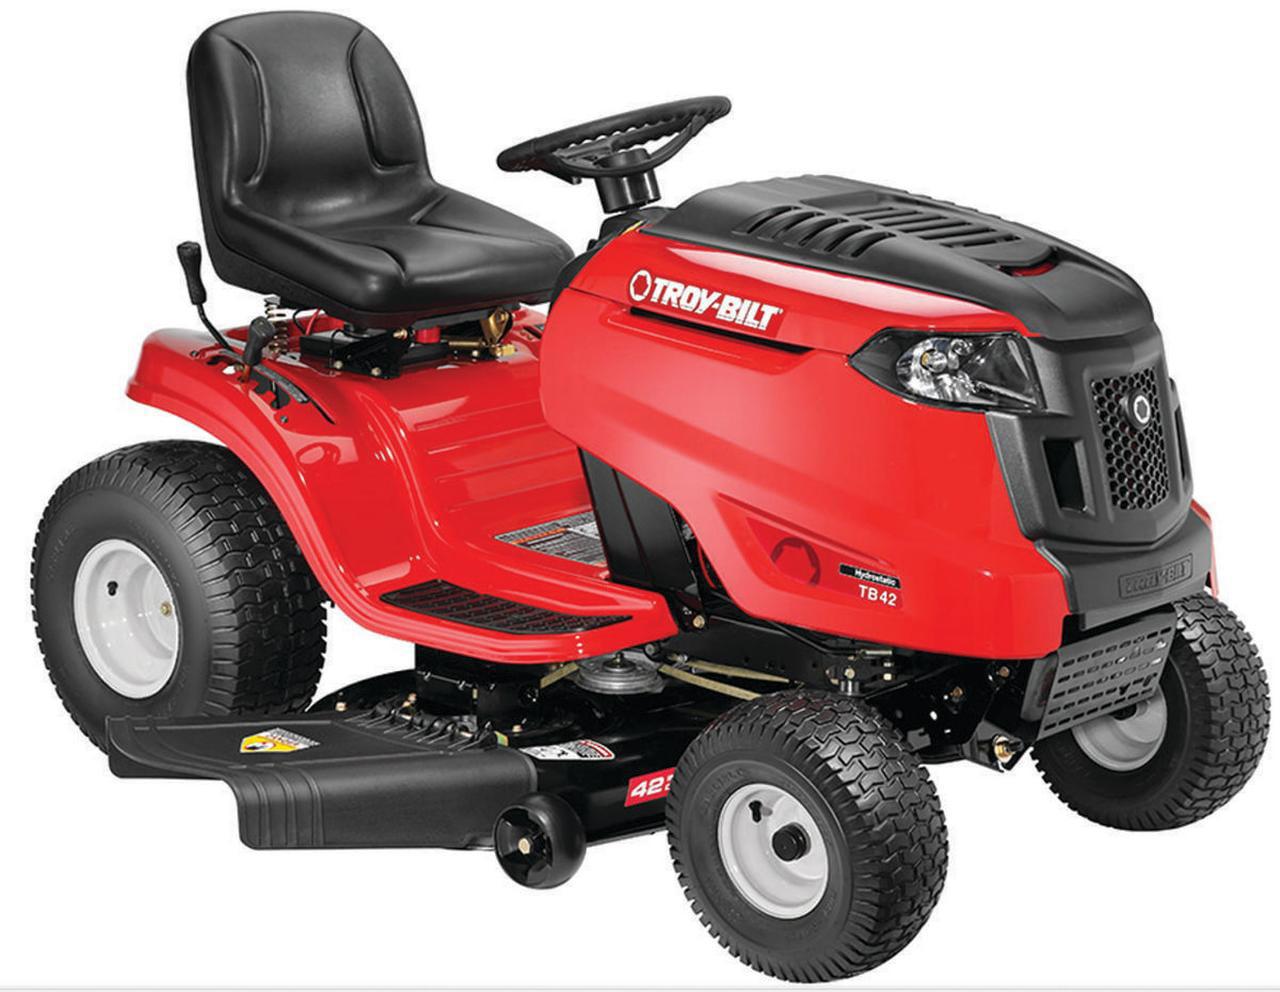 Troy-Bilt 13AAA1KT066 Hydrostatic Riding Lawn Mower, 46 in W, 17.5 hp, 656 cc by MTD Products